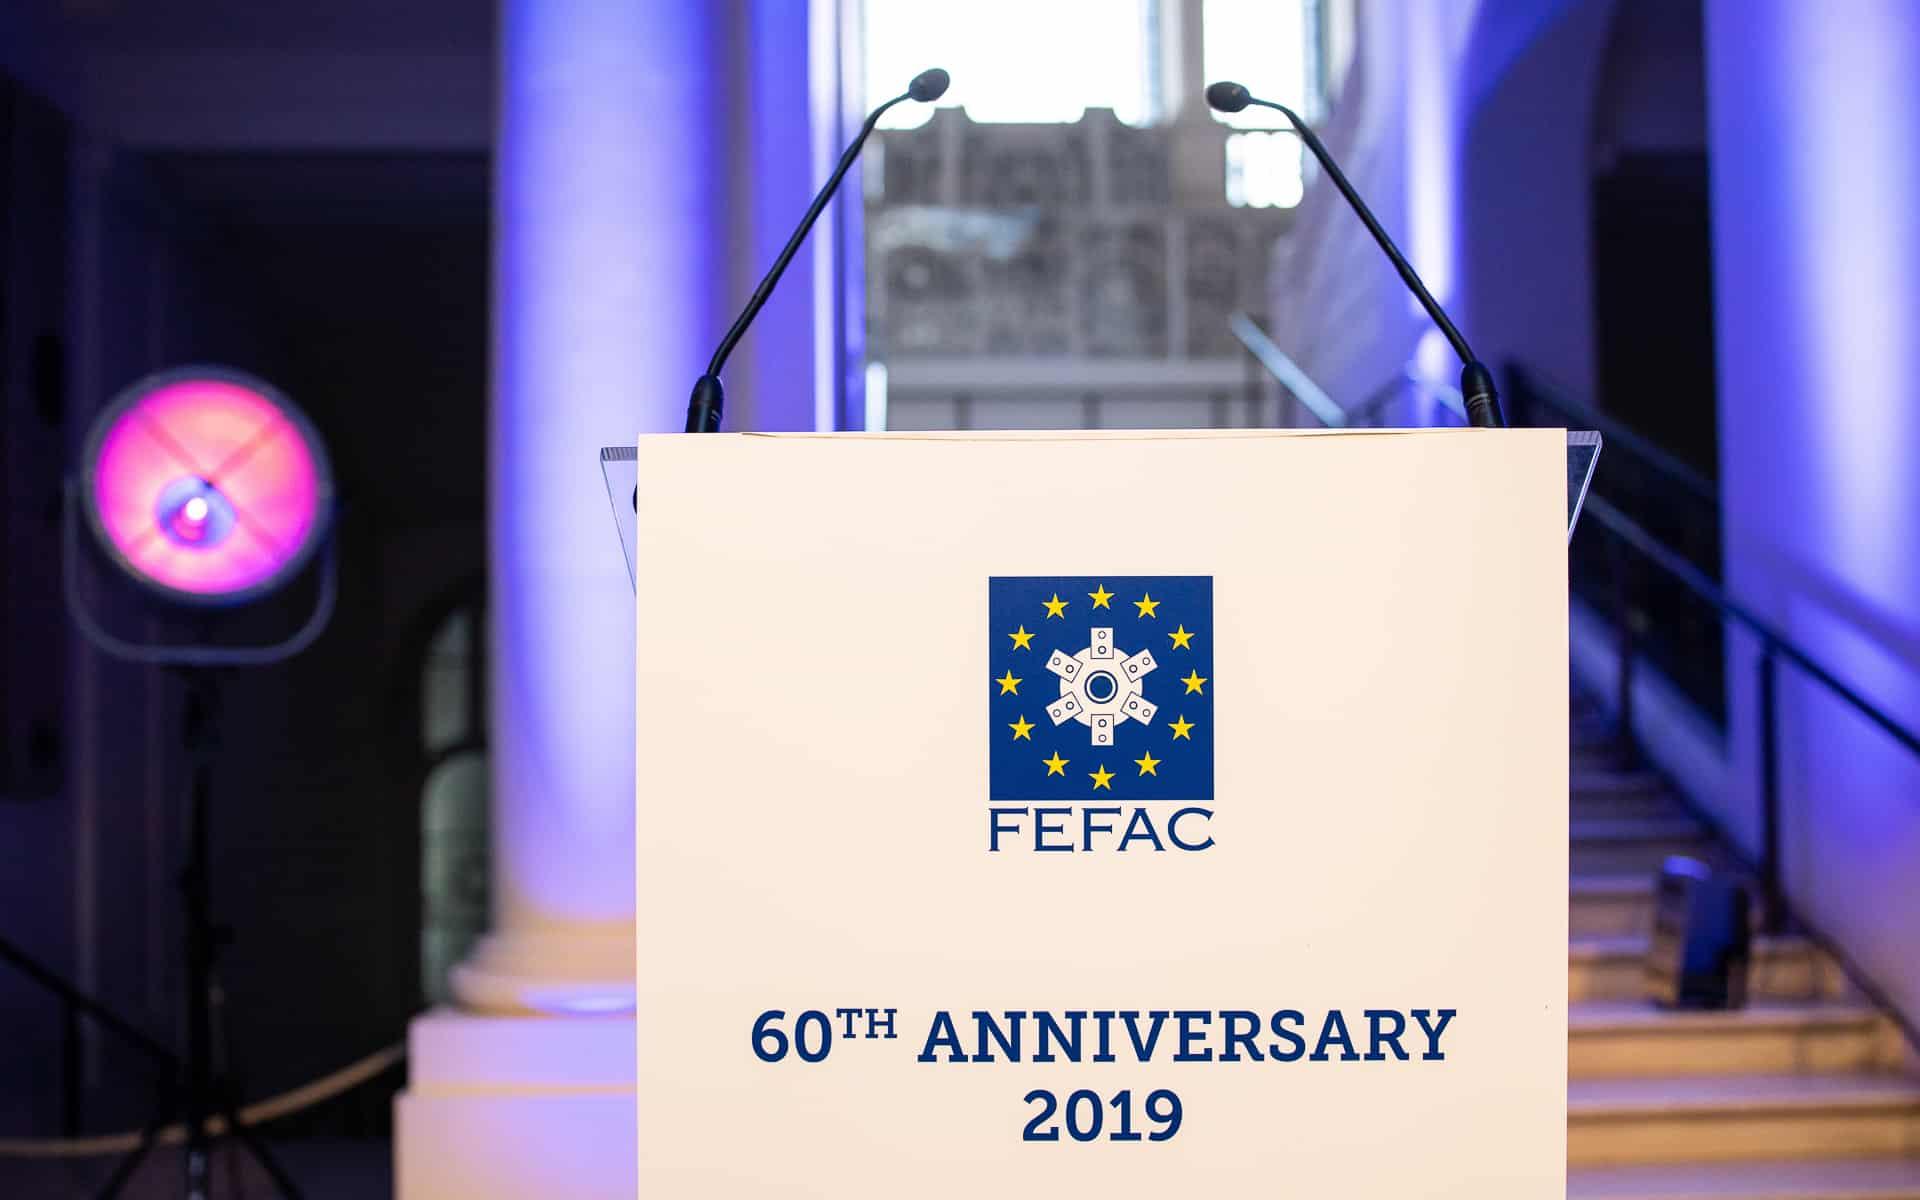 fefac-60th-anniversary-mrah-00005